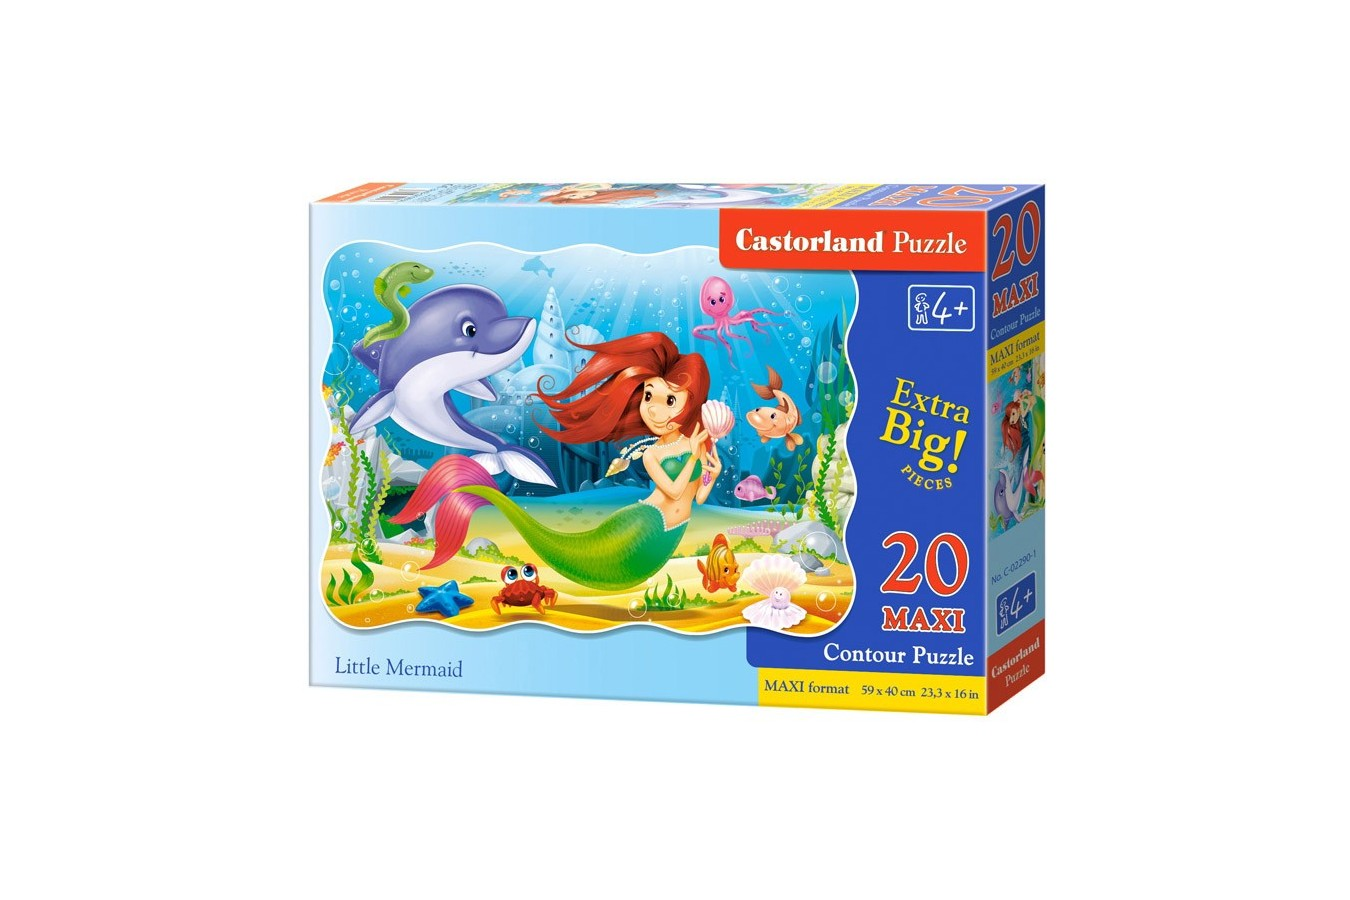 Puzzle Castorland Maxi - Little Mermaid, 20 Piese